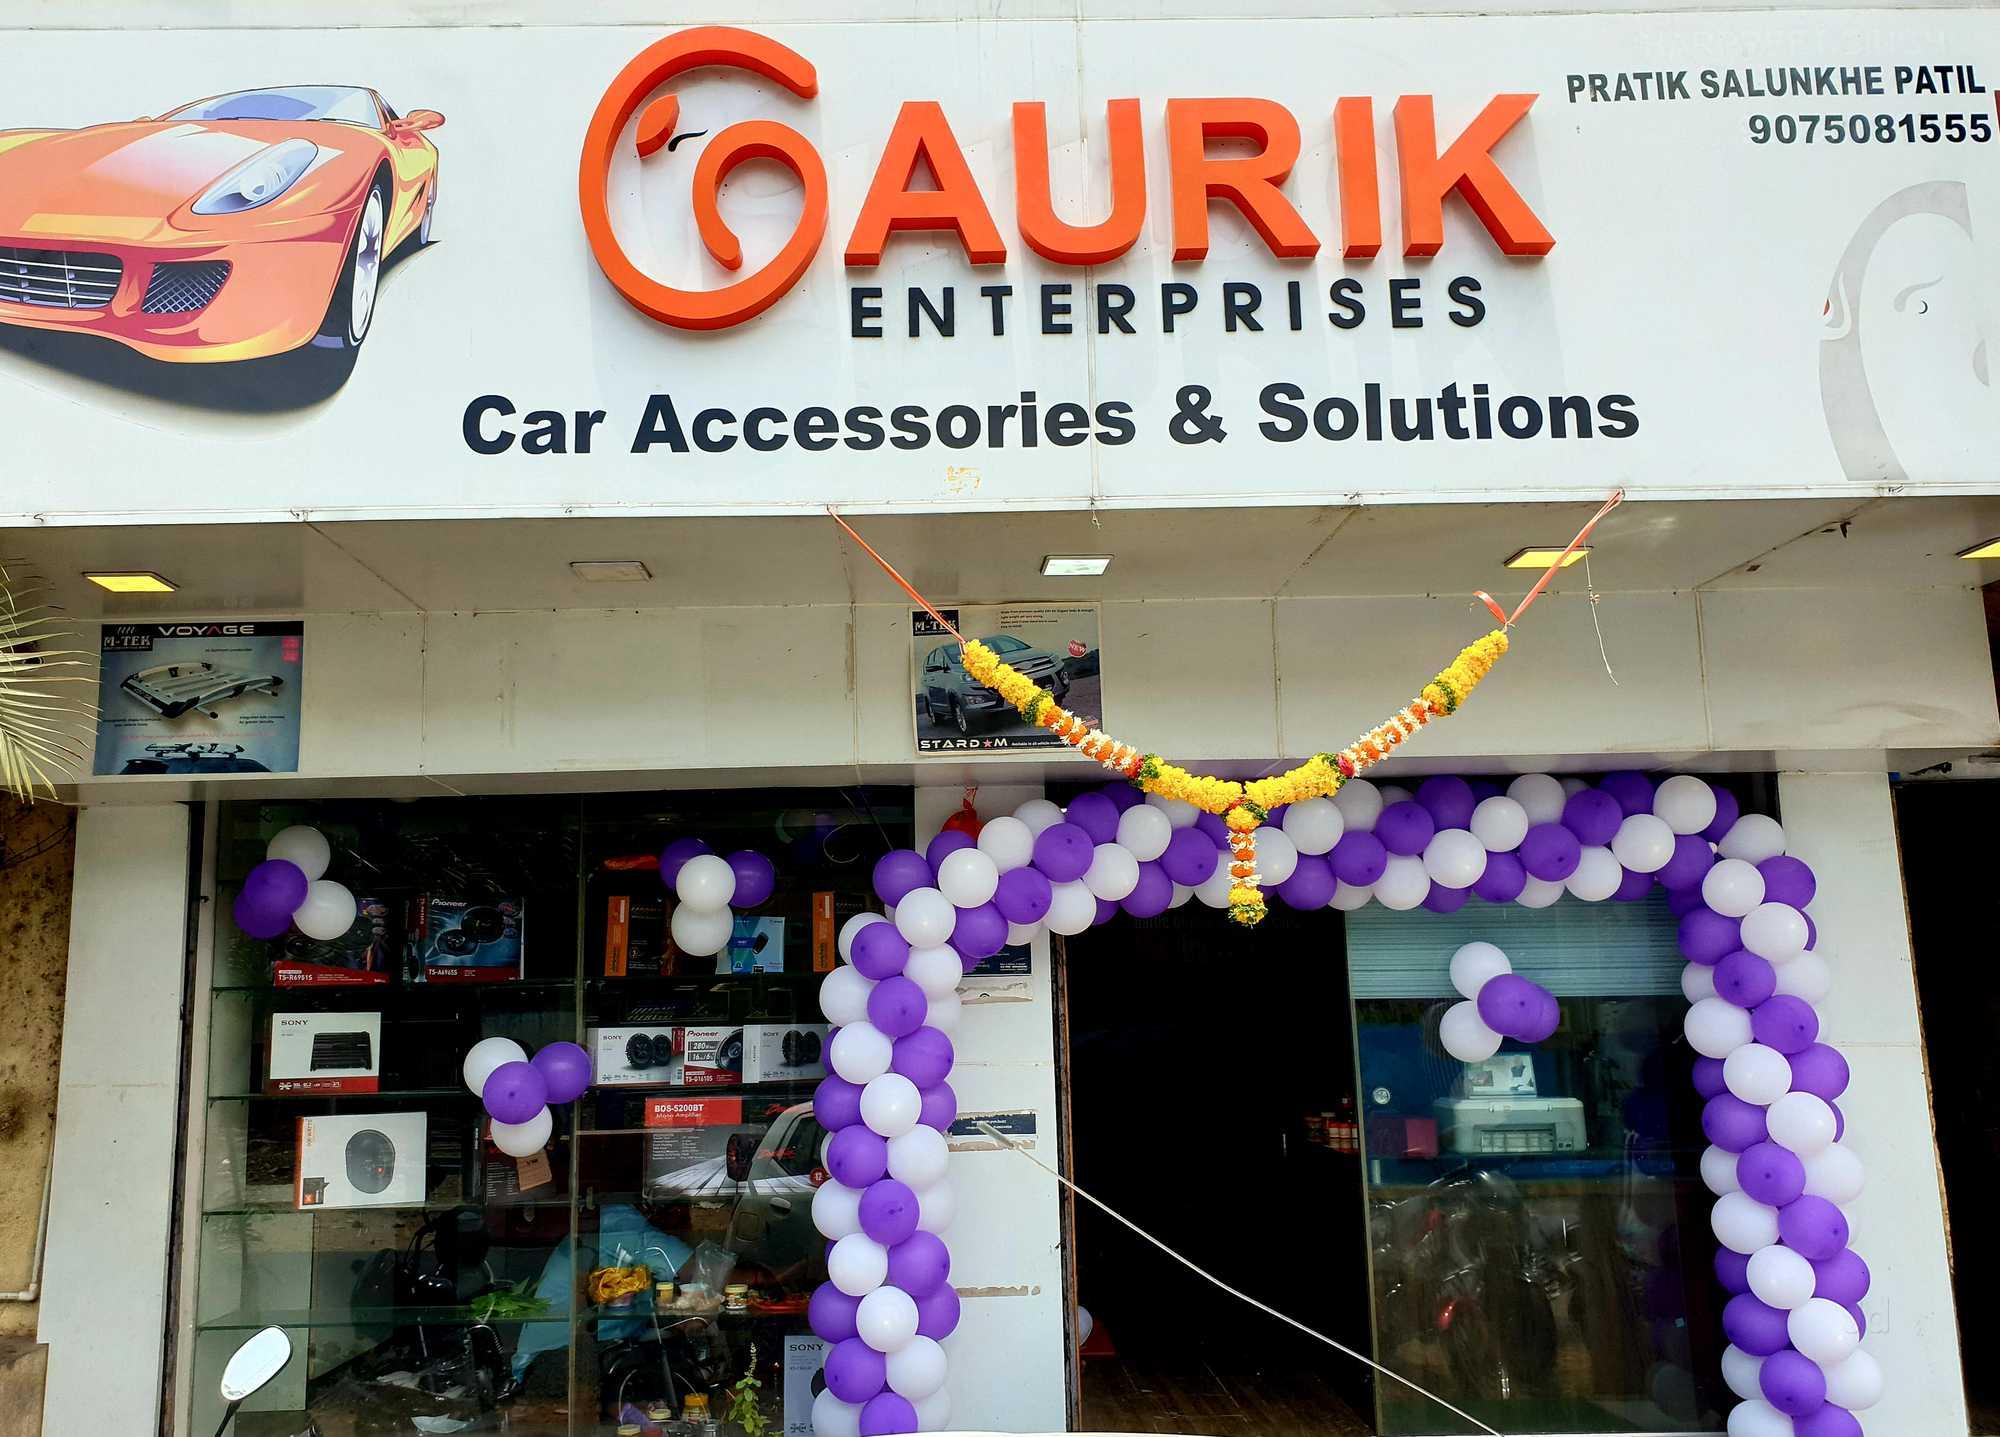 Car Accessory Dealers in Dhayari, Pune - Car Accessories